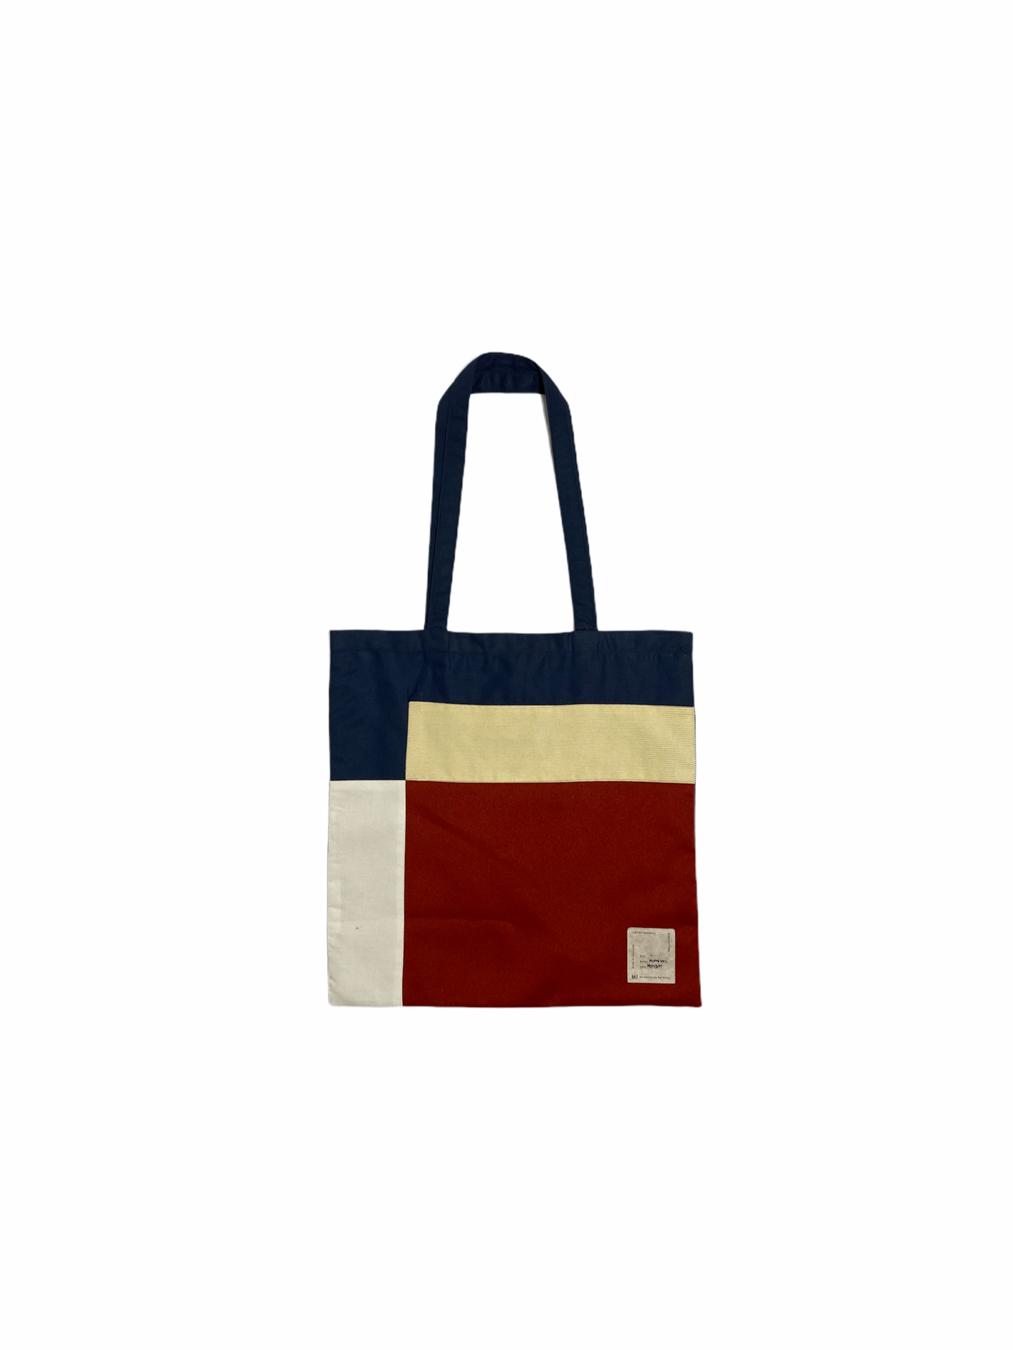 Mongkol  Tote Bag (Monday)